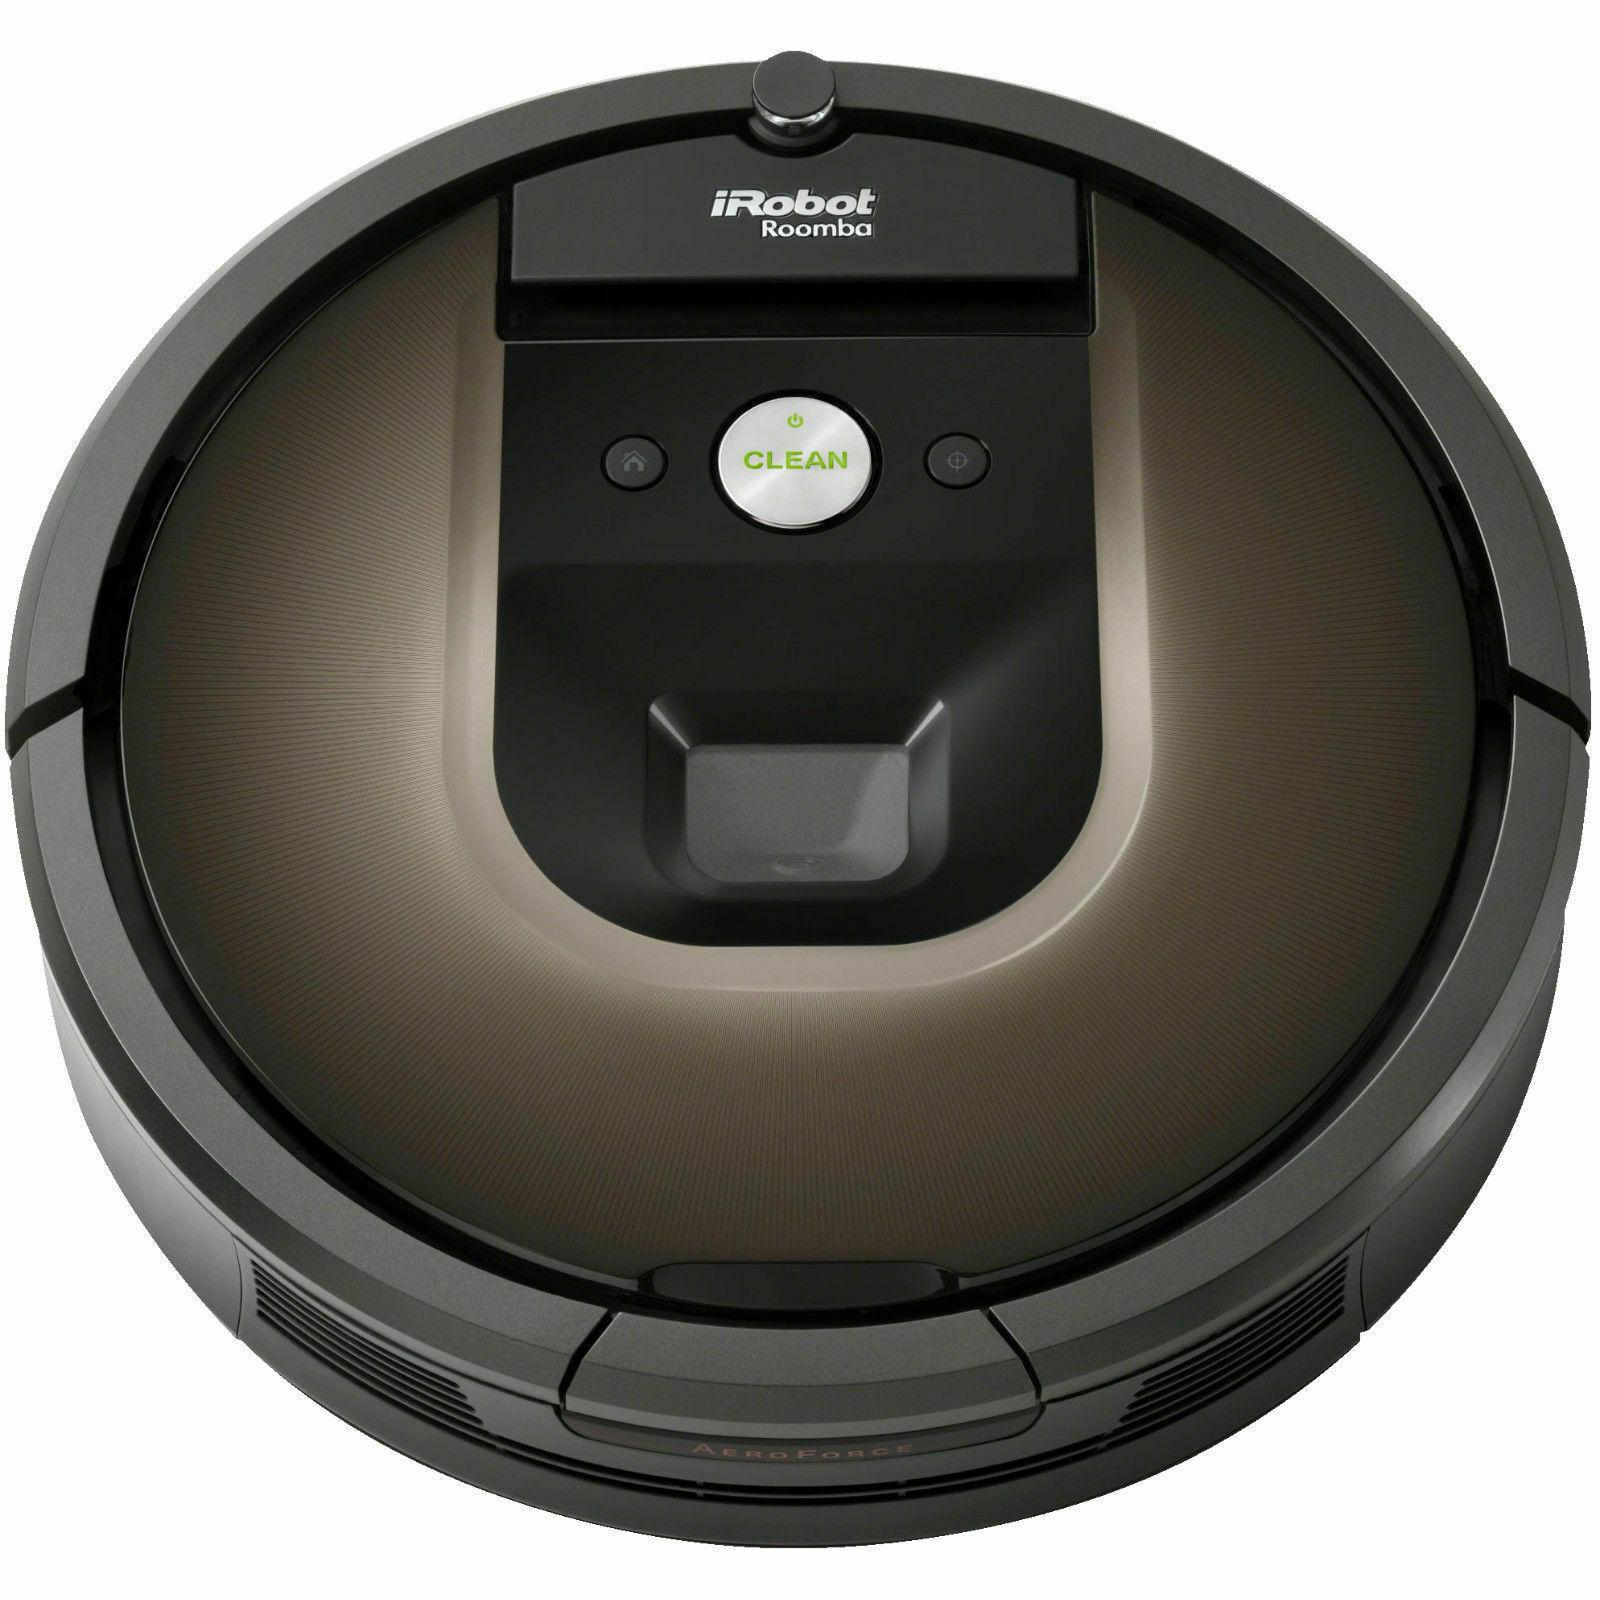 iRobot Roomba 980 Staubsauger Saugroboter mit WLAN für 439,20 €